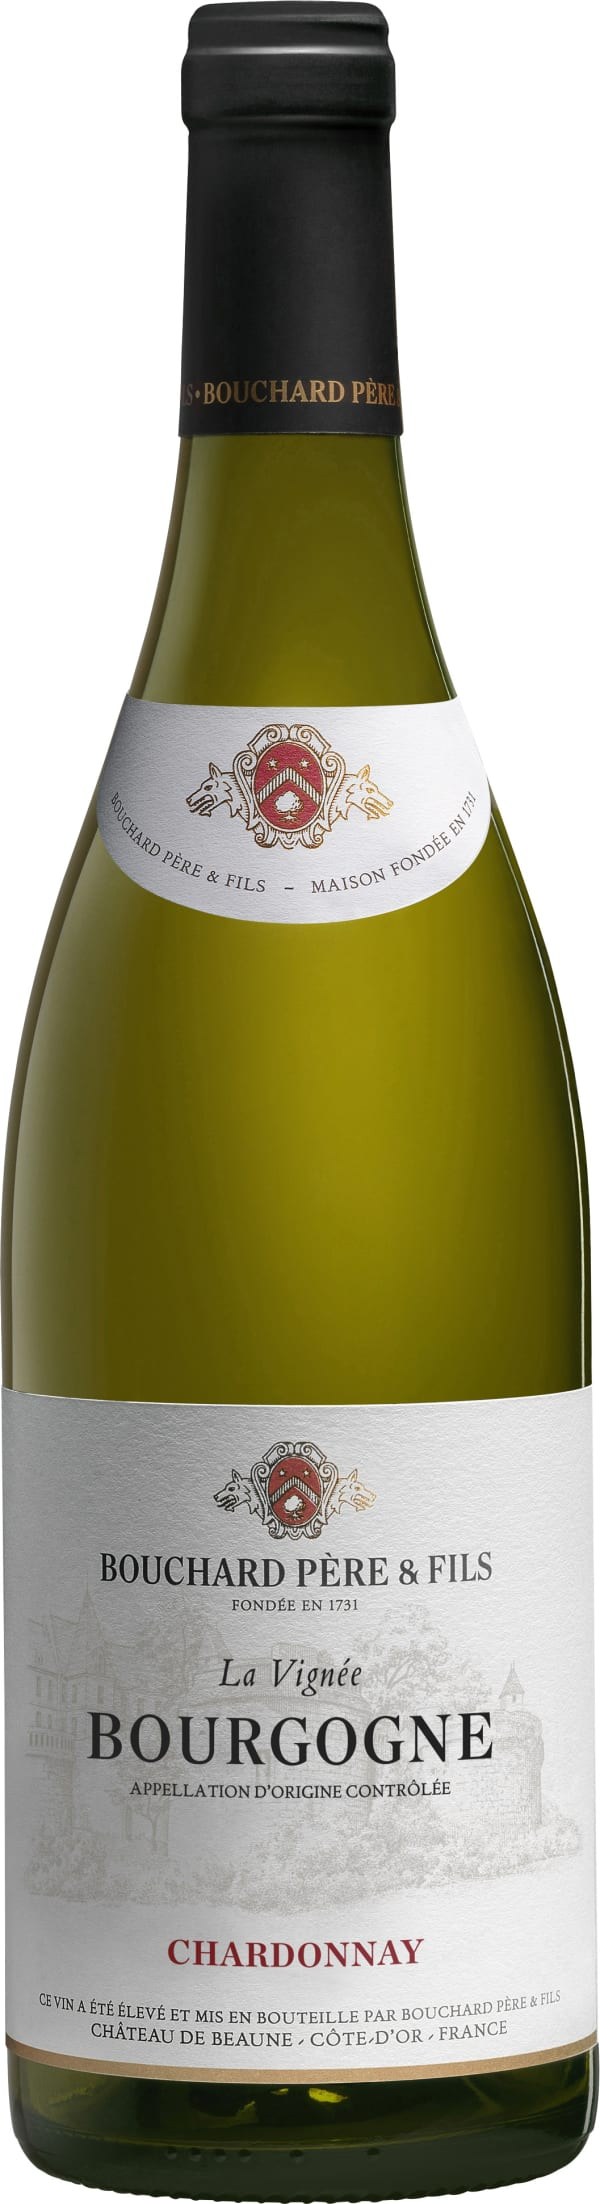 Bouchard La Vignée Chardonnay 2015